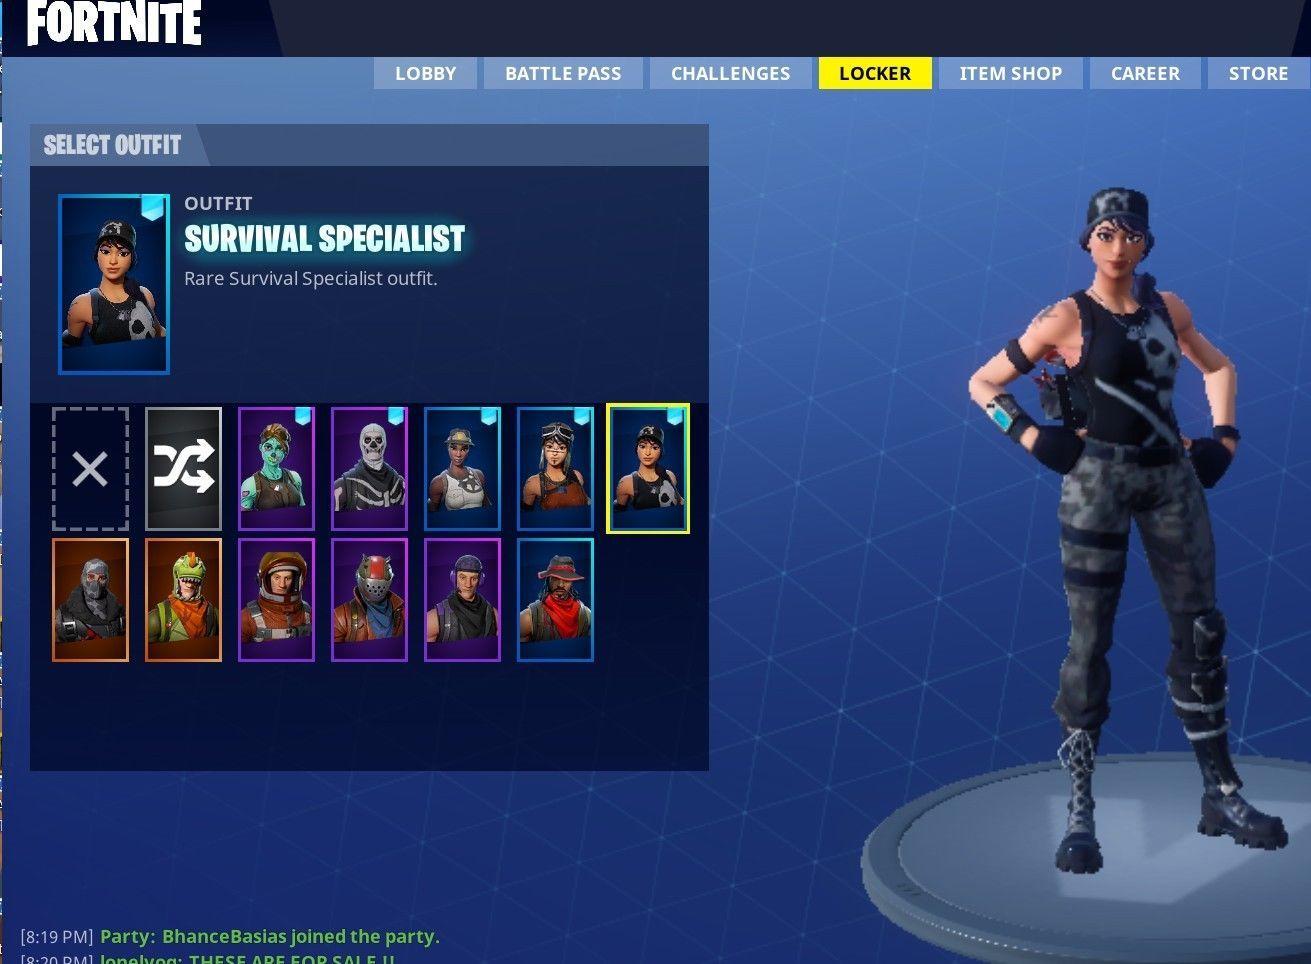 Fortnite Account Skull Trooper Ghoul Trooper Cheap Jh In 2019